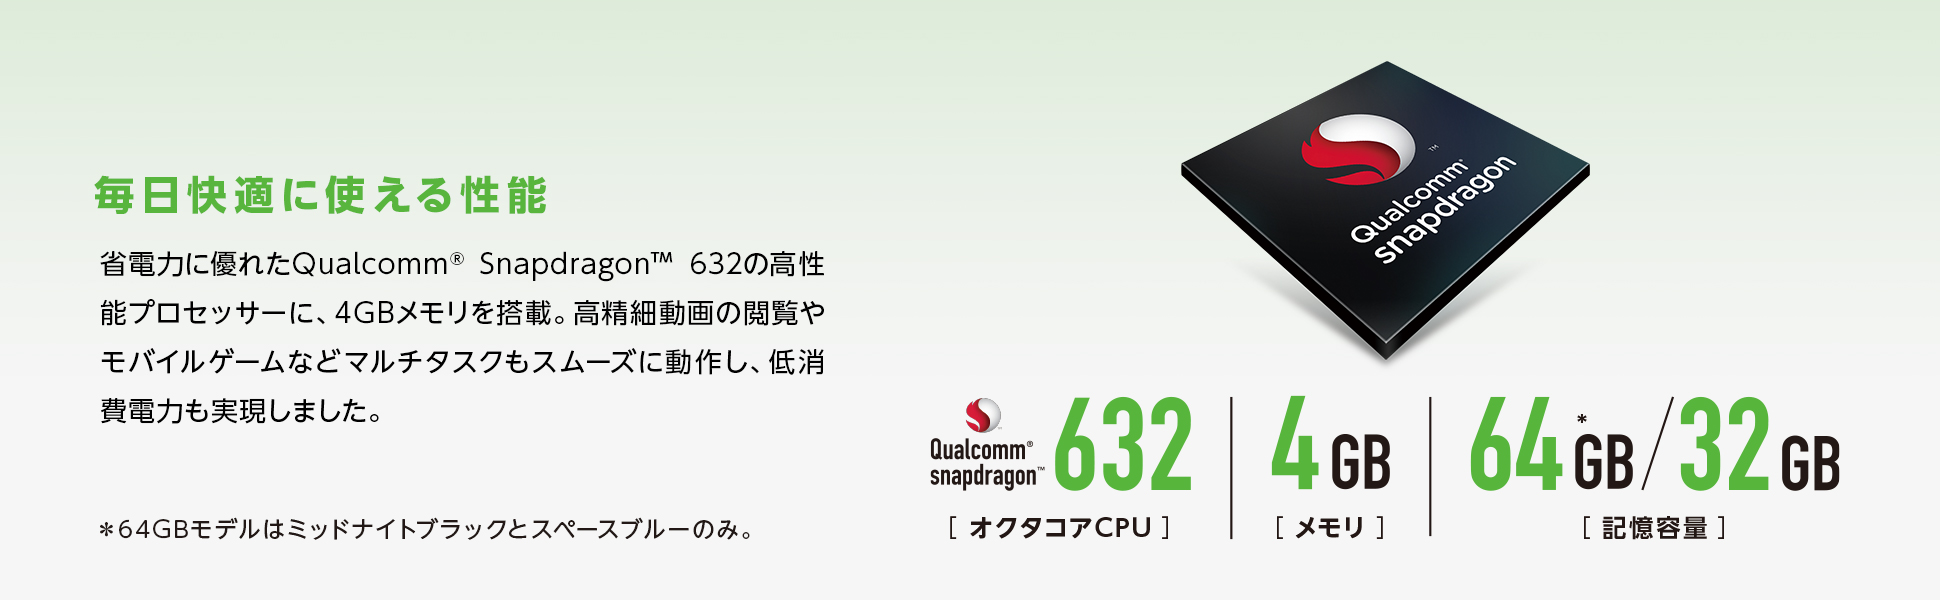 ZenFone_Max_M2